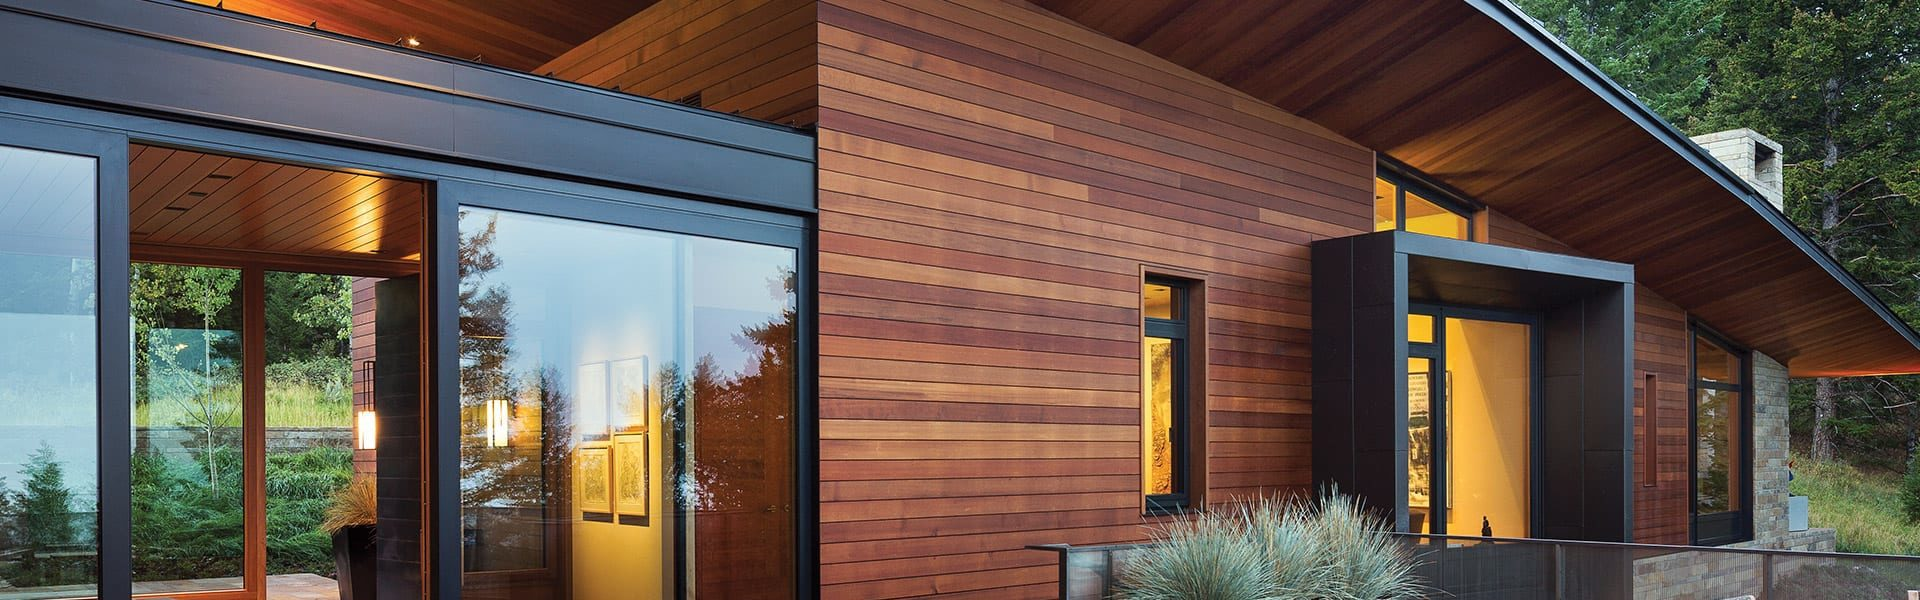 Summit Exterior Cladding System | Ipe Rainscreen Siding | Rainscreen Siding Installation | Architectural Cladding Distributor